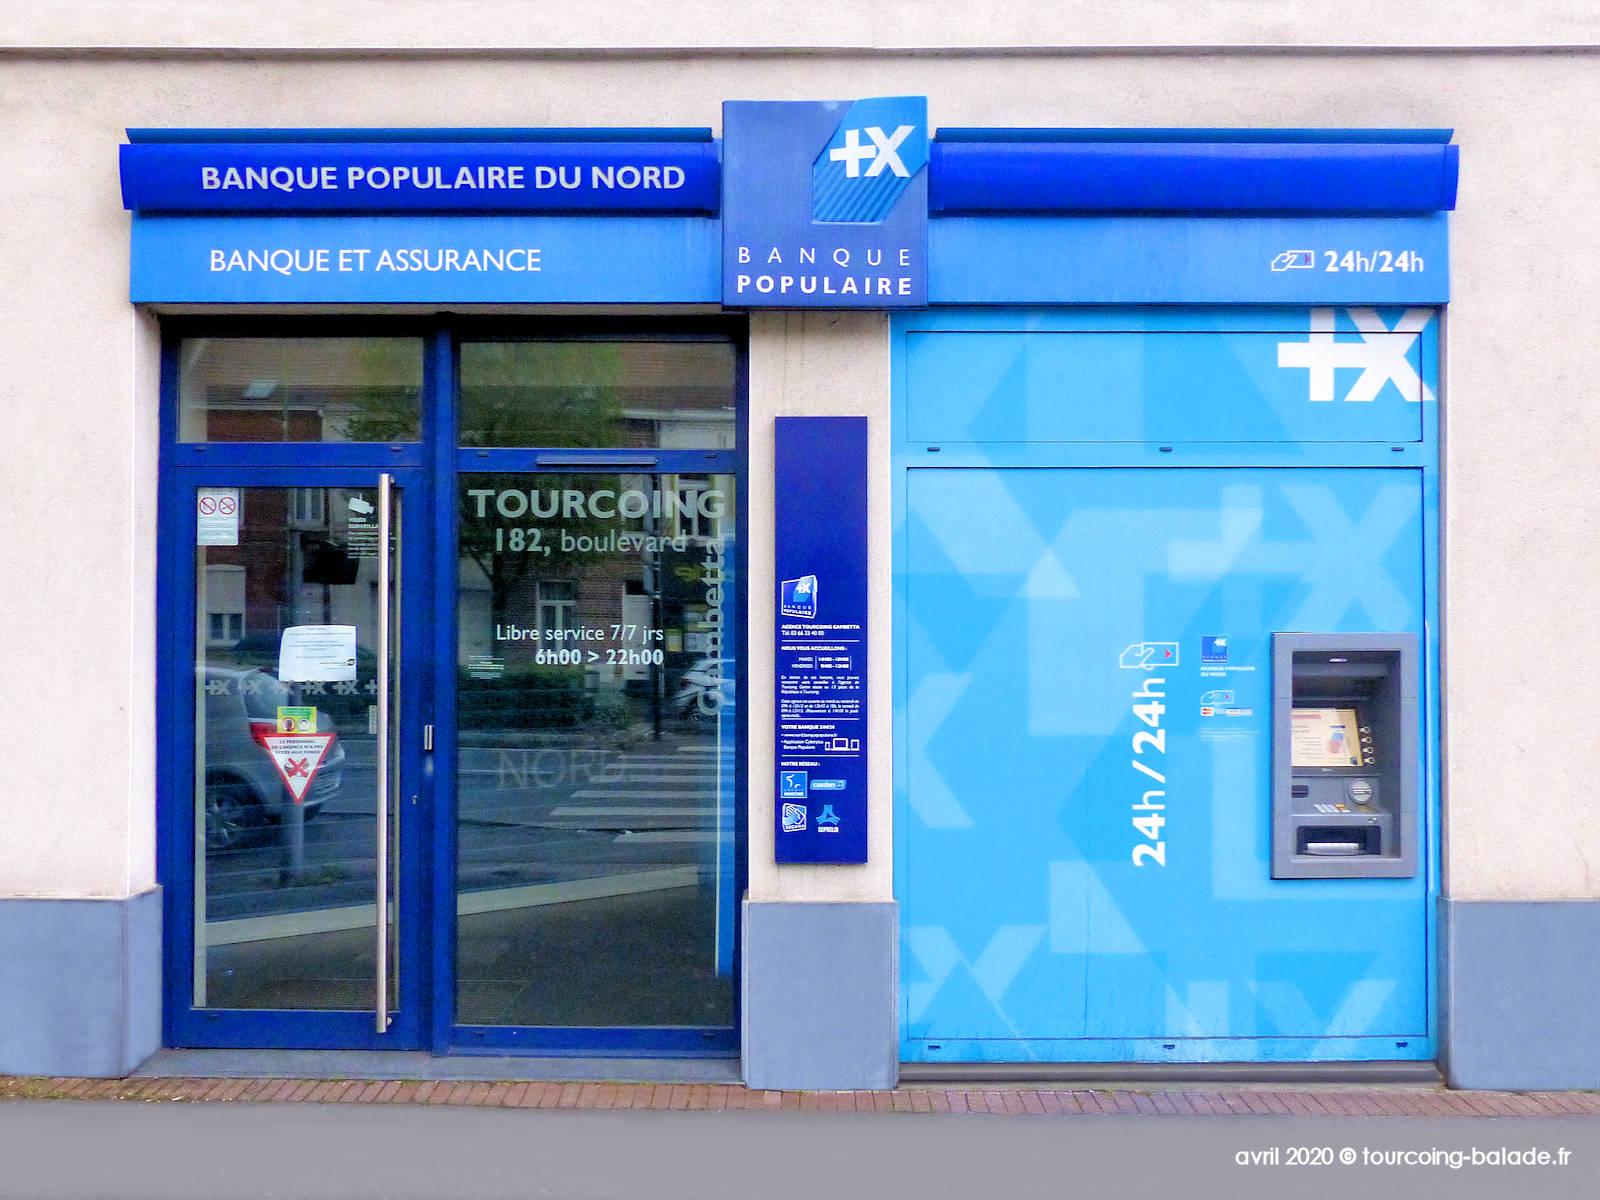 Distributeur Banque Populaire Gambetta, Tourcoing - 2020.